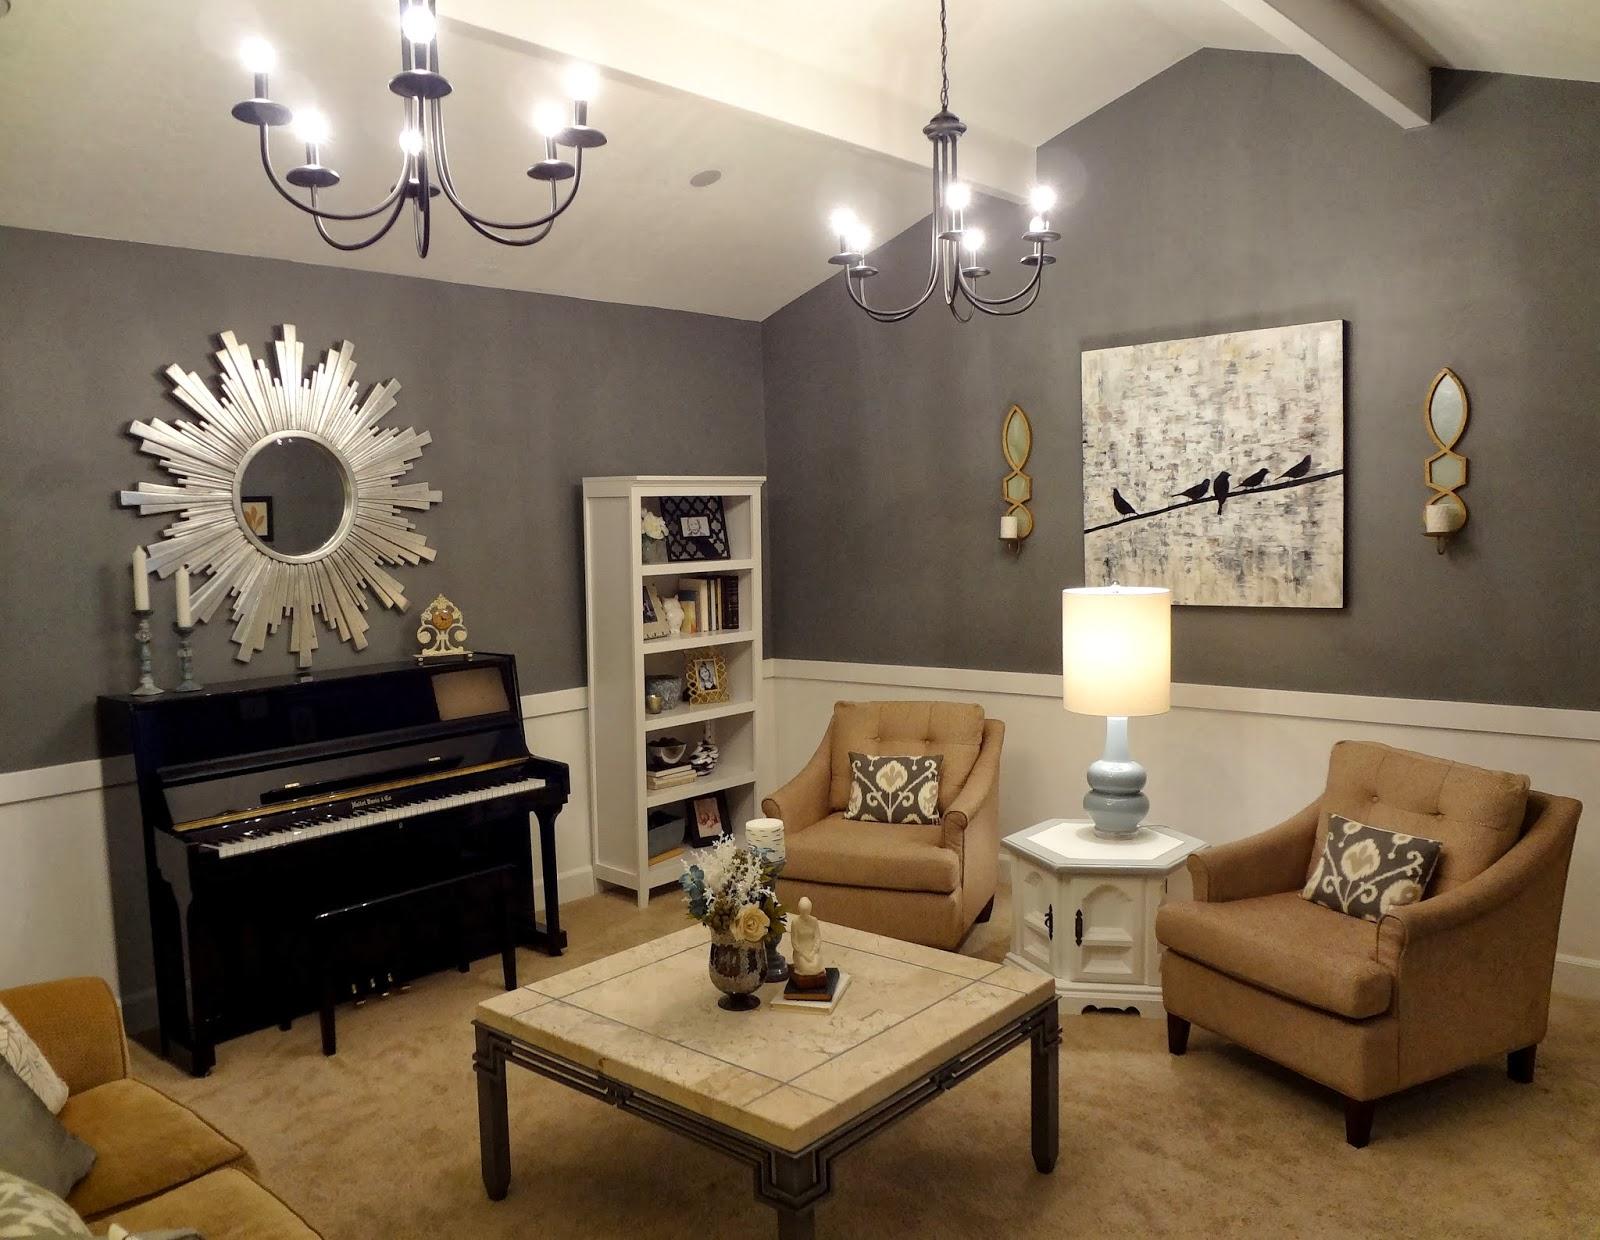 Studio 7 interior design the importance of proper lighting for Ambient lighting living room